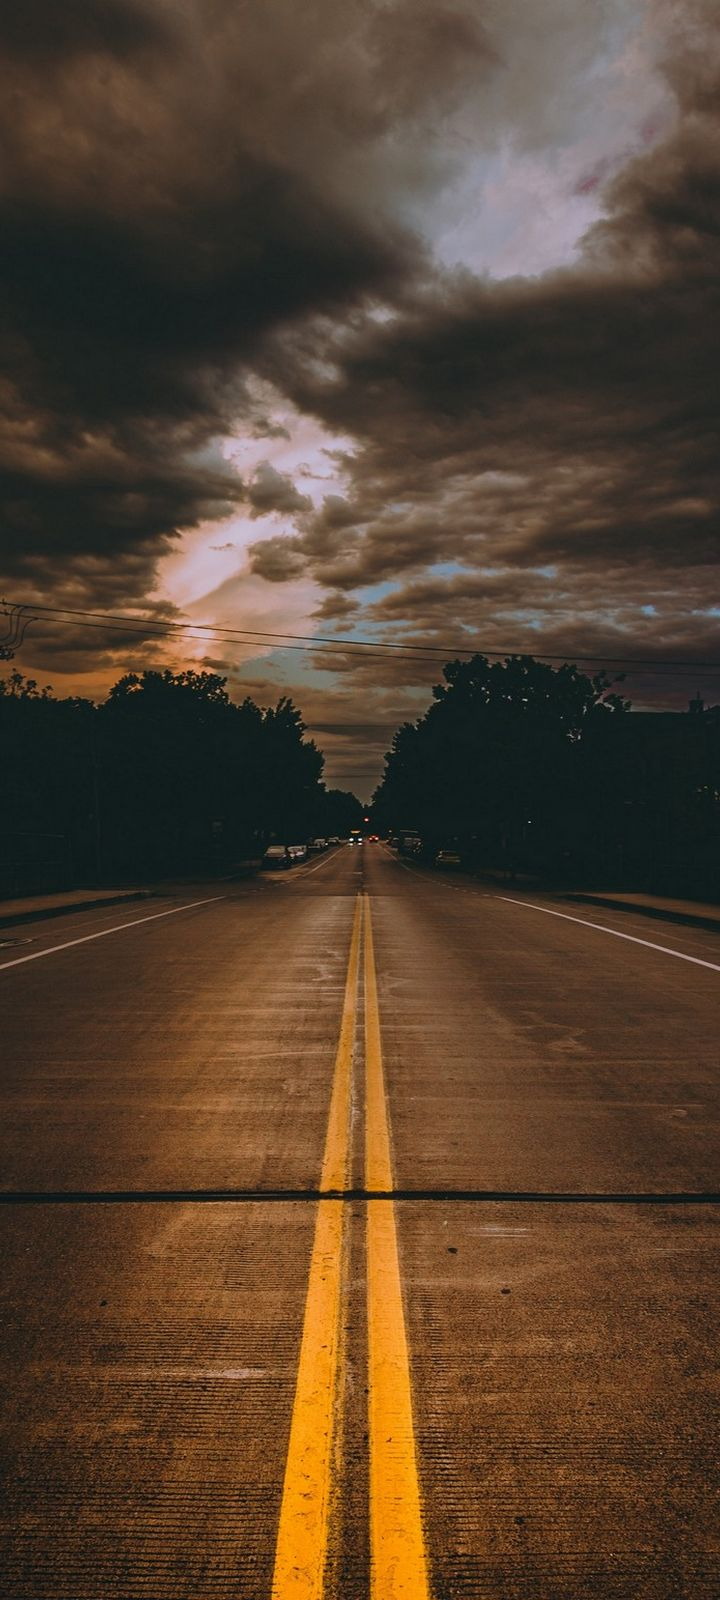 Road Marking Cloudy Wallpaper 720x1600